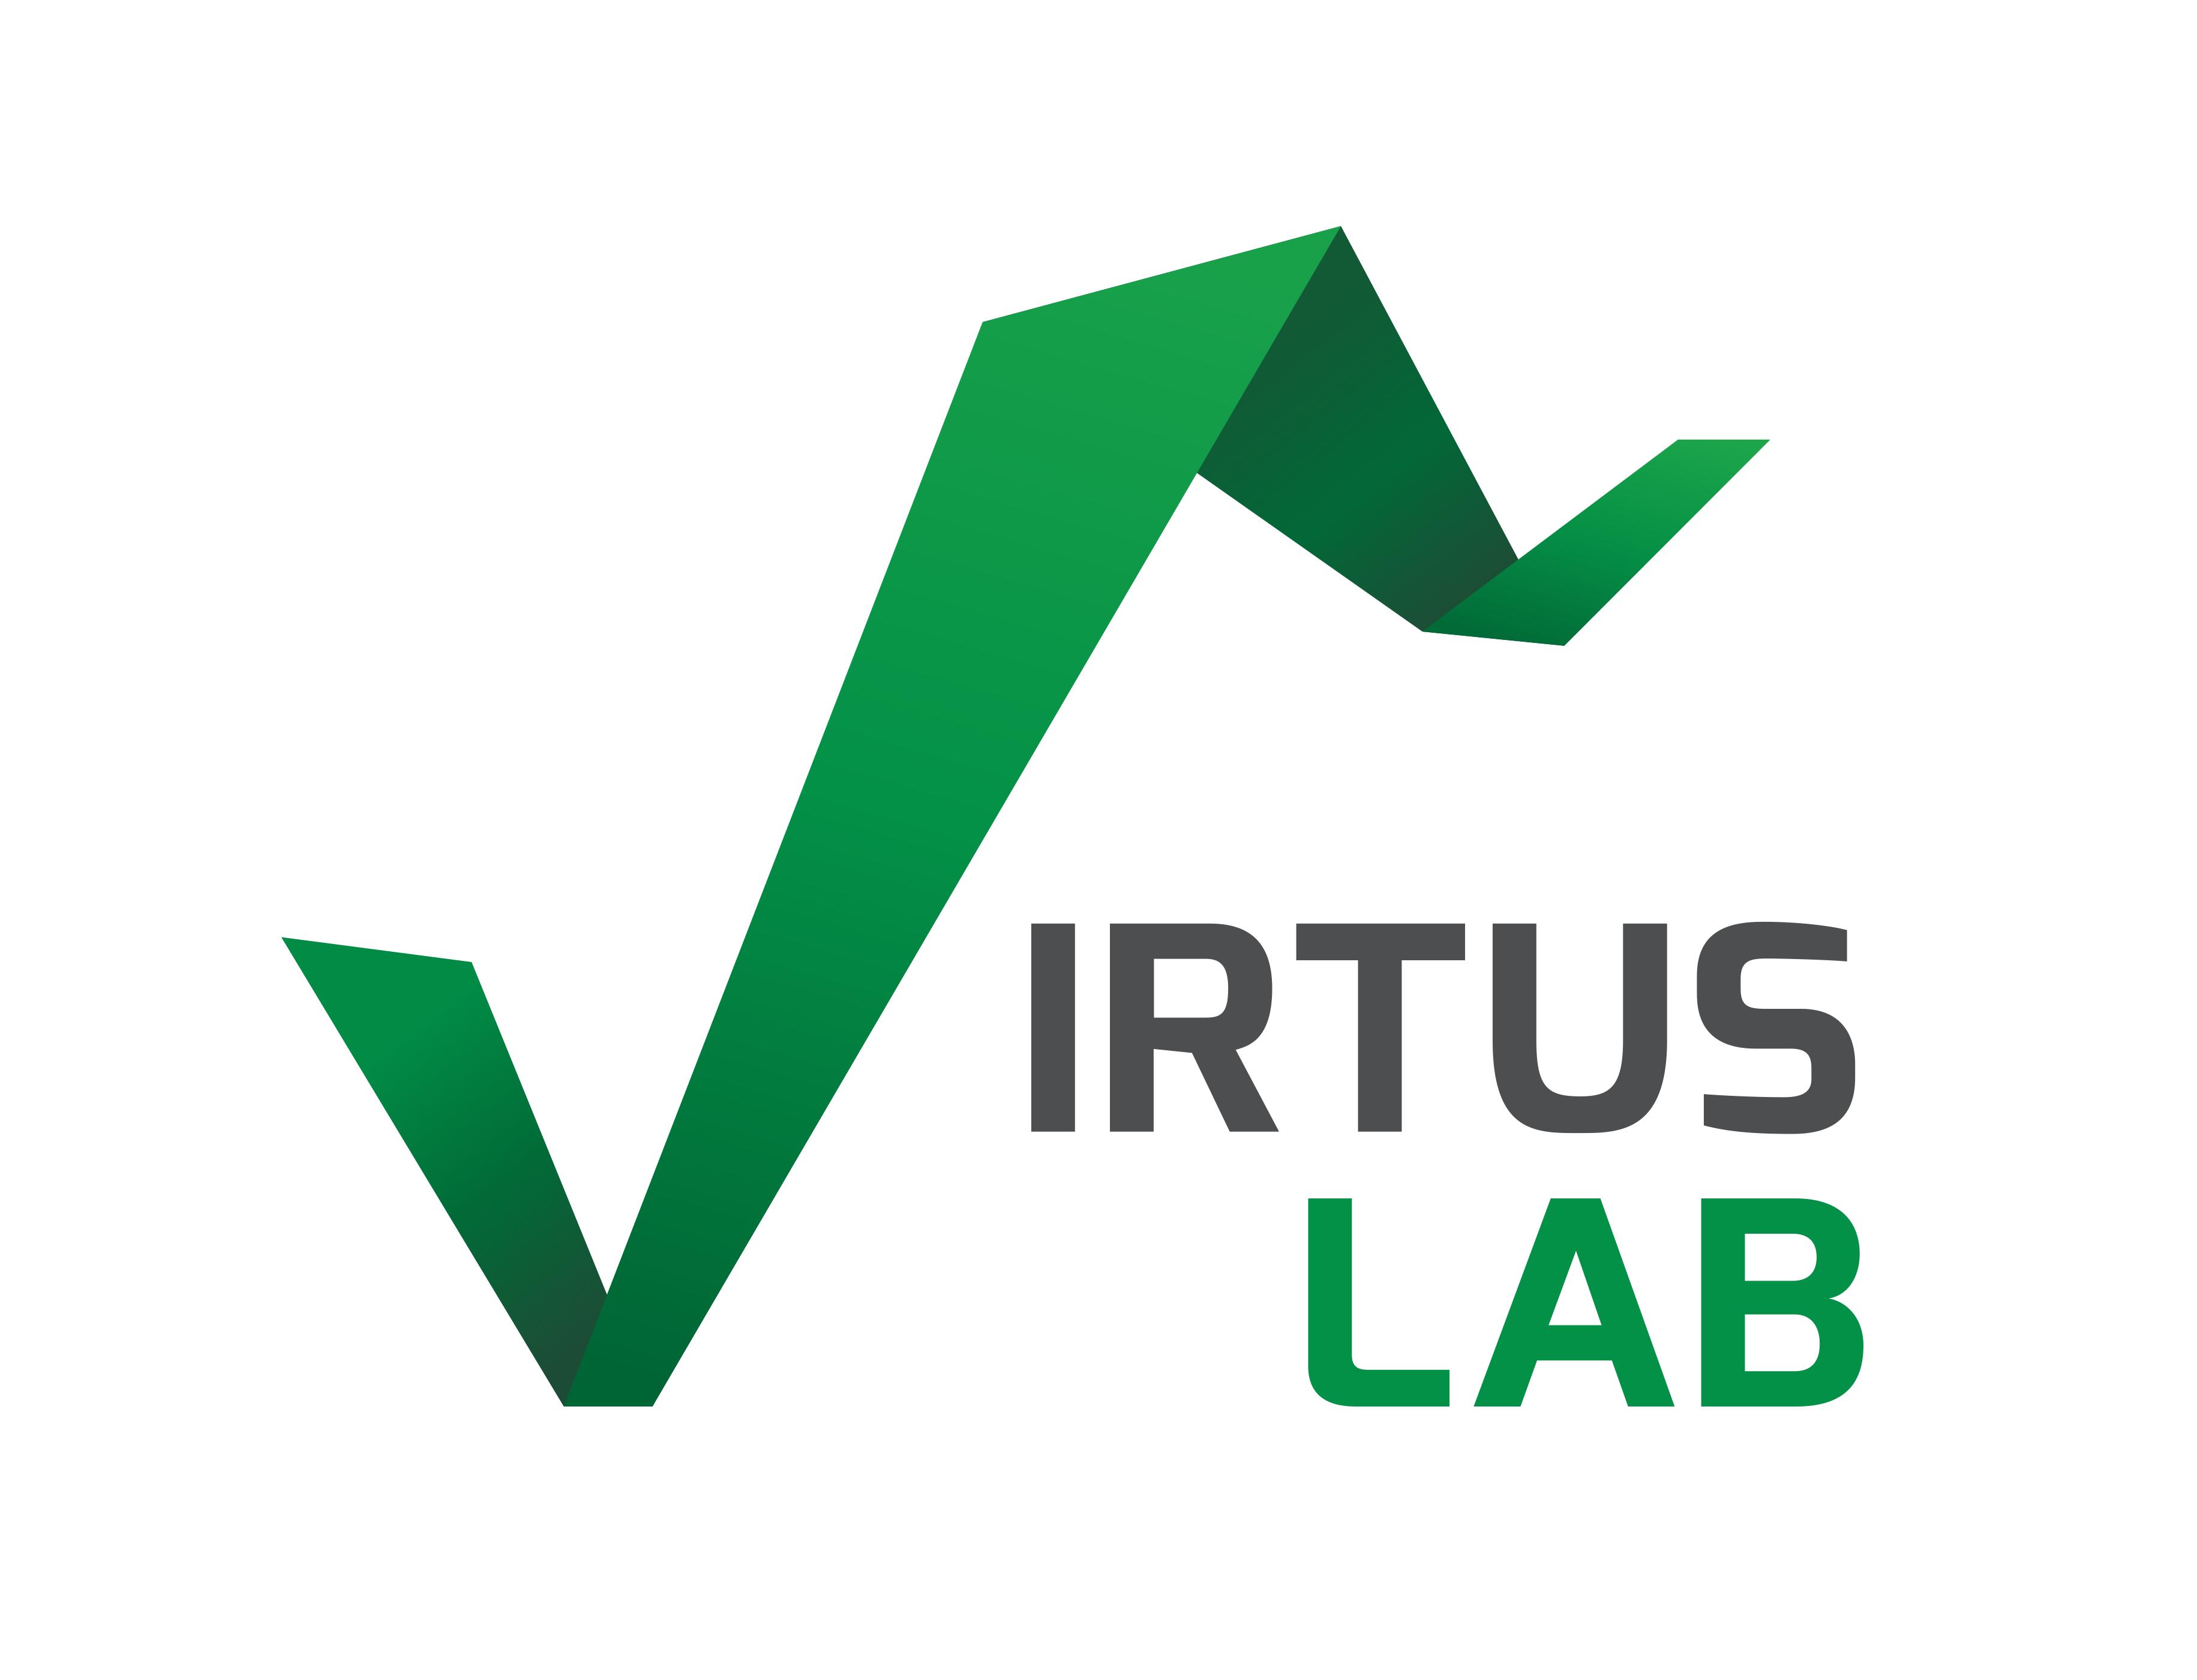 VirtusLab